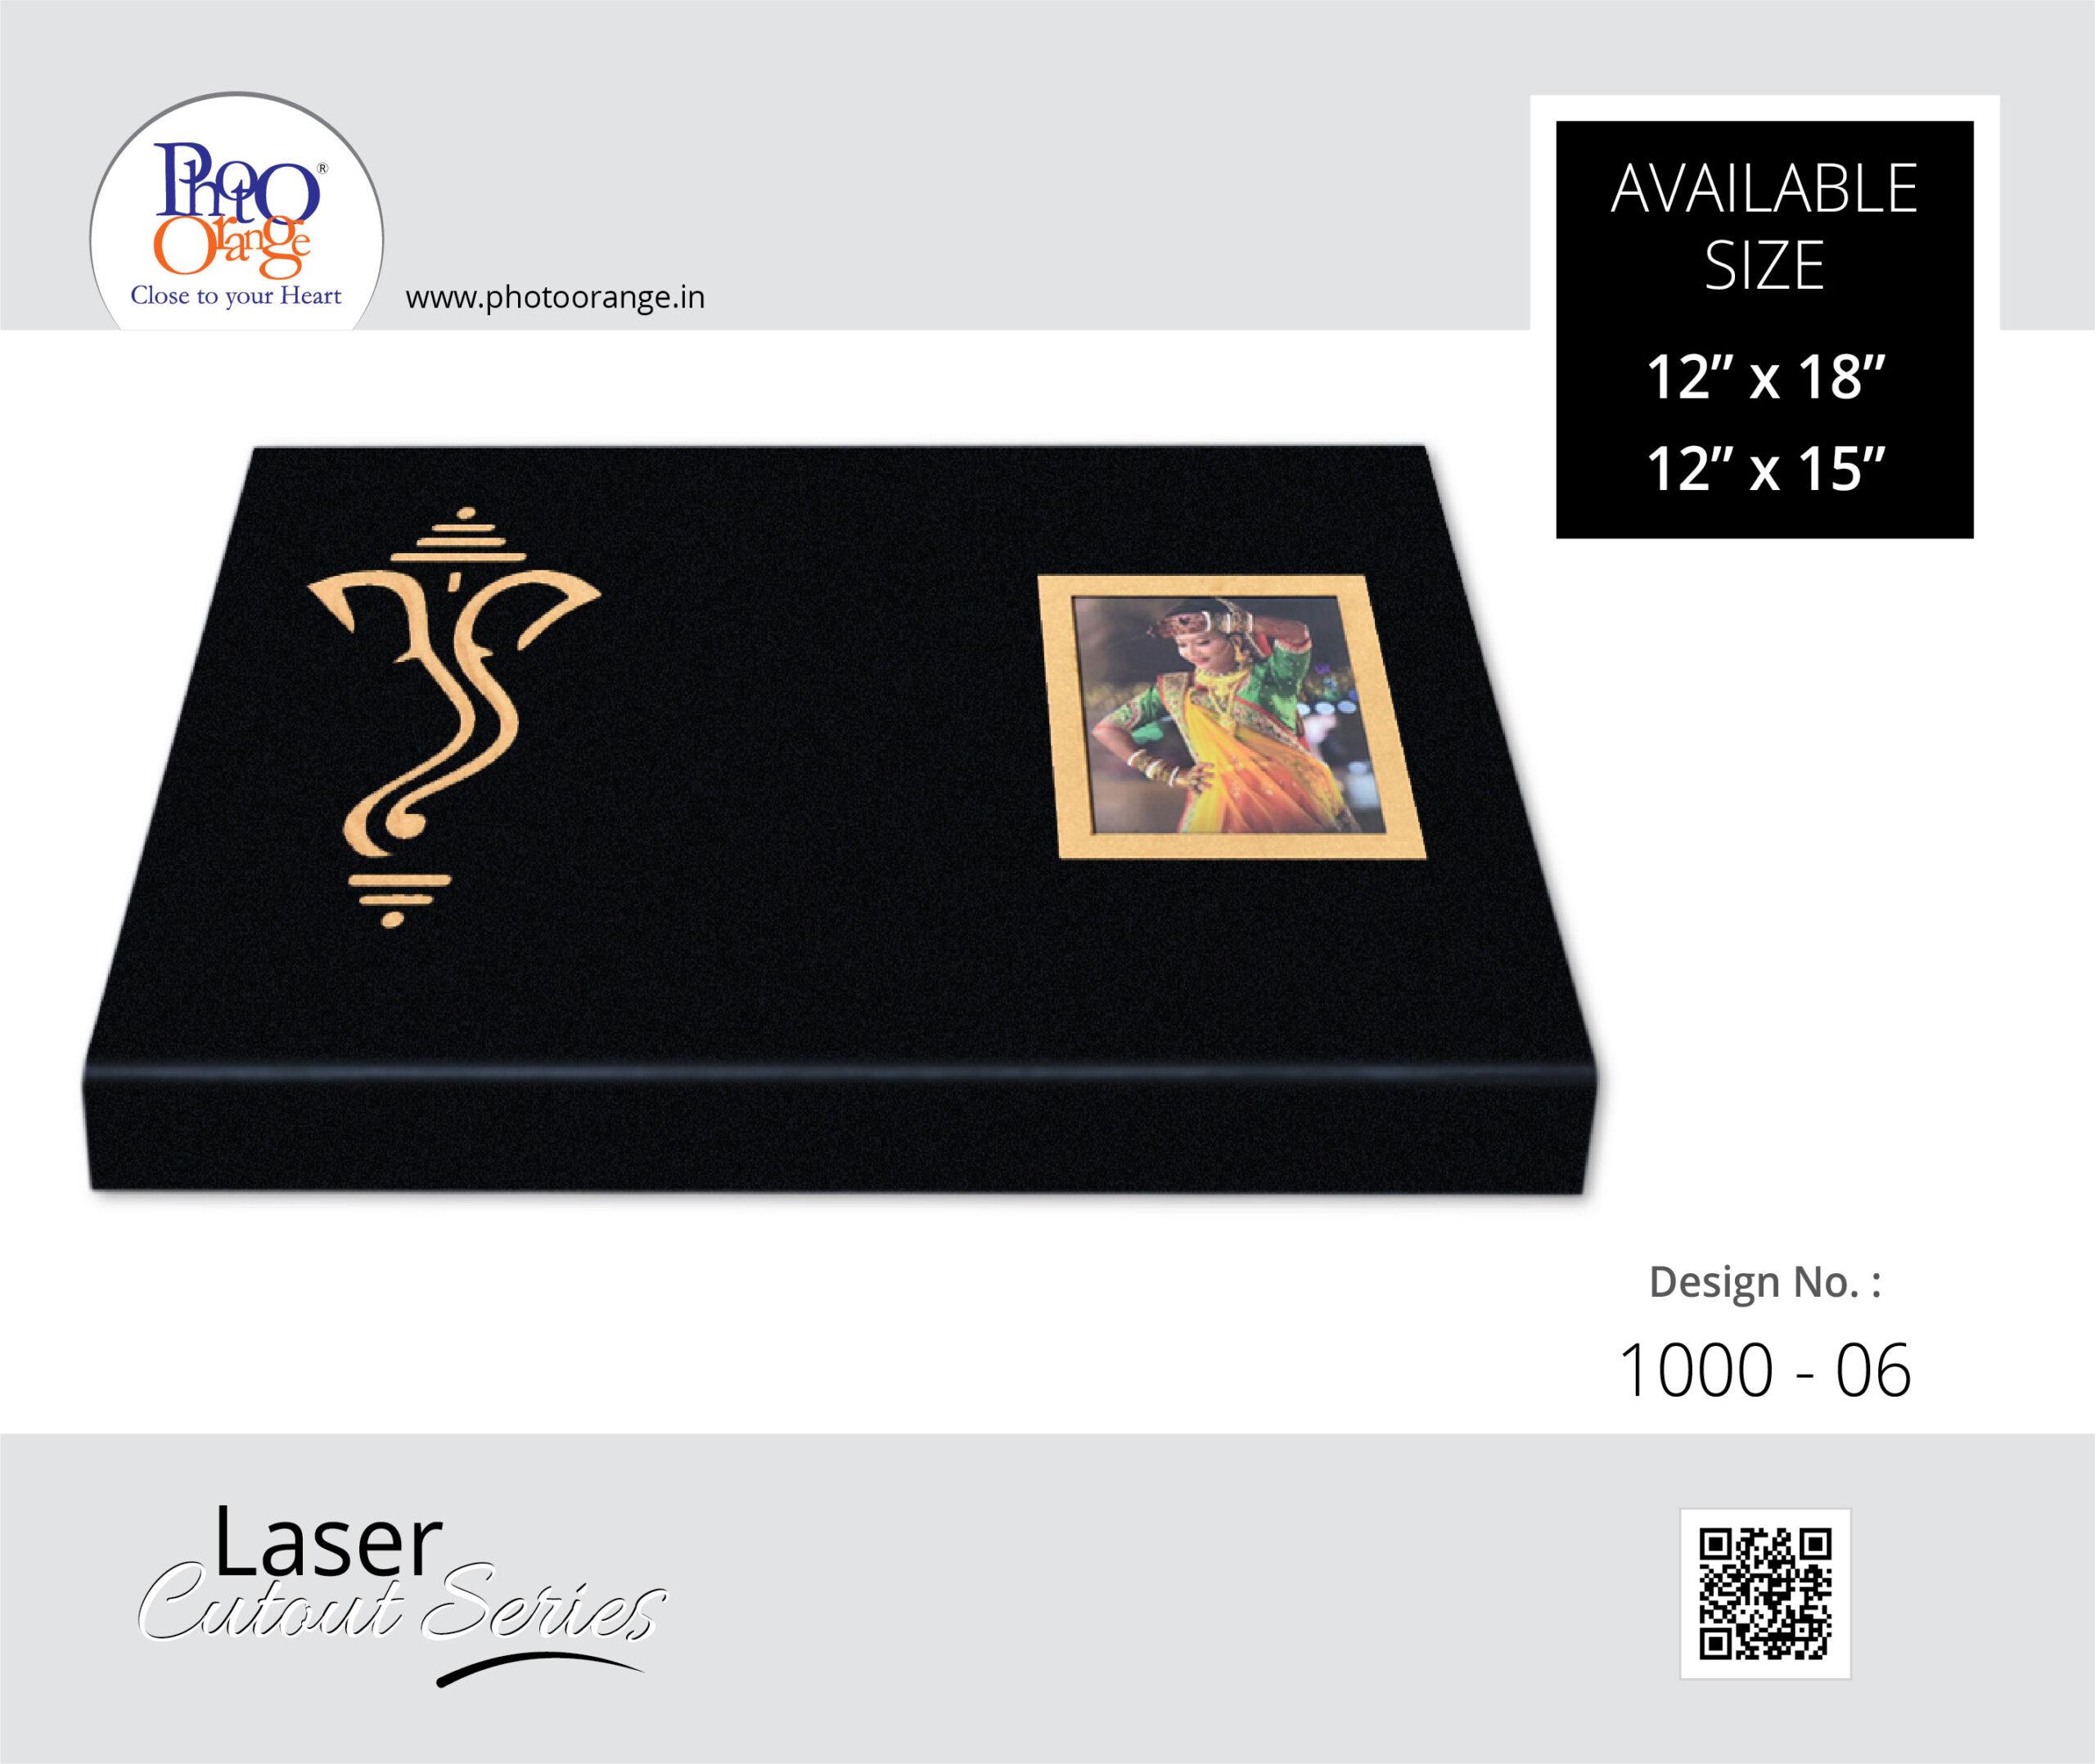 Laser Cutout Series 1000 01